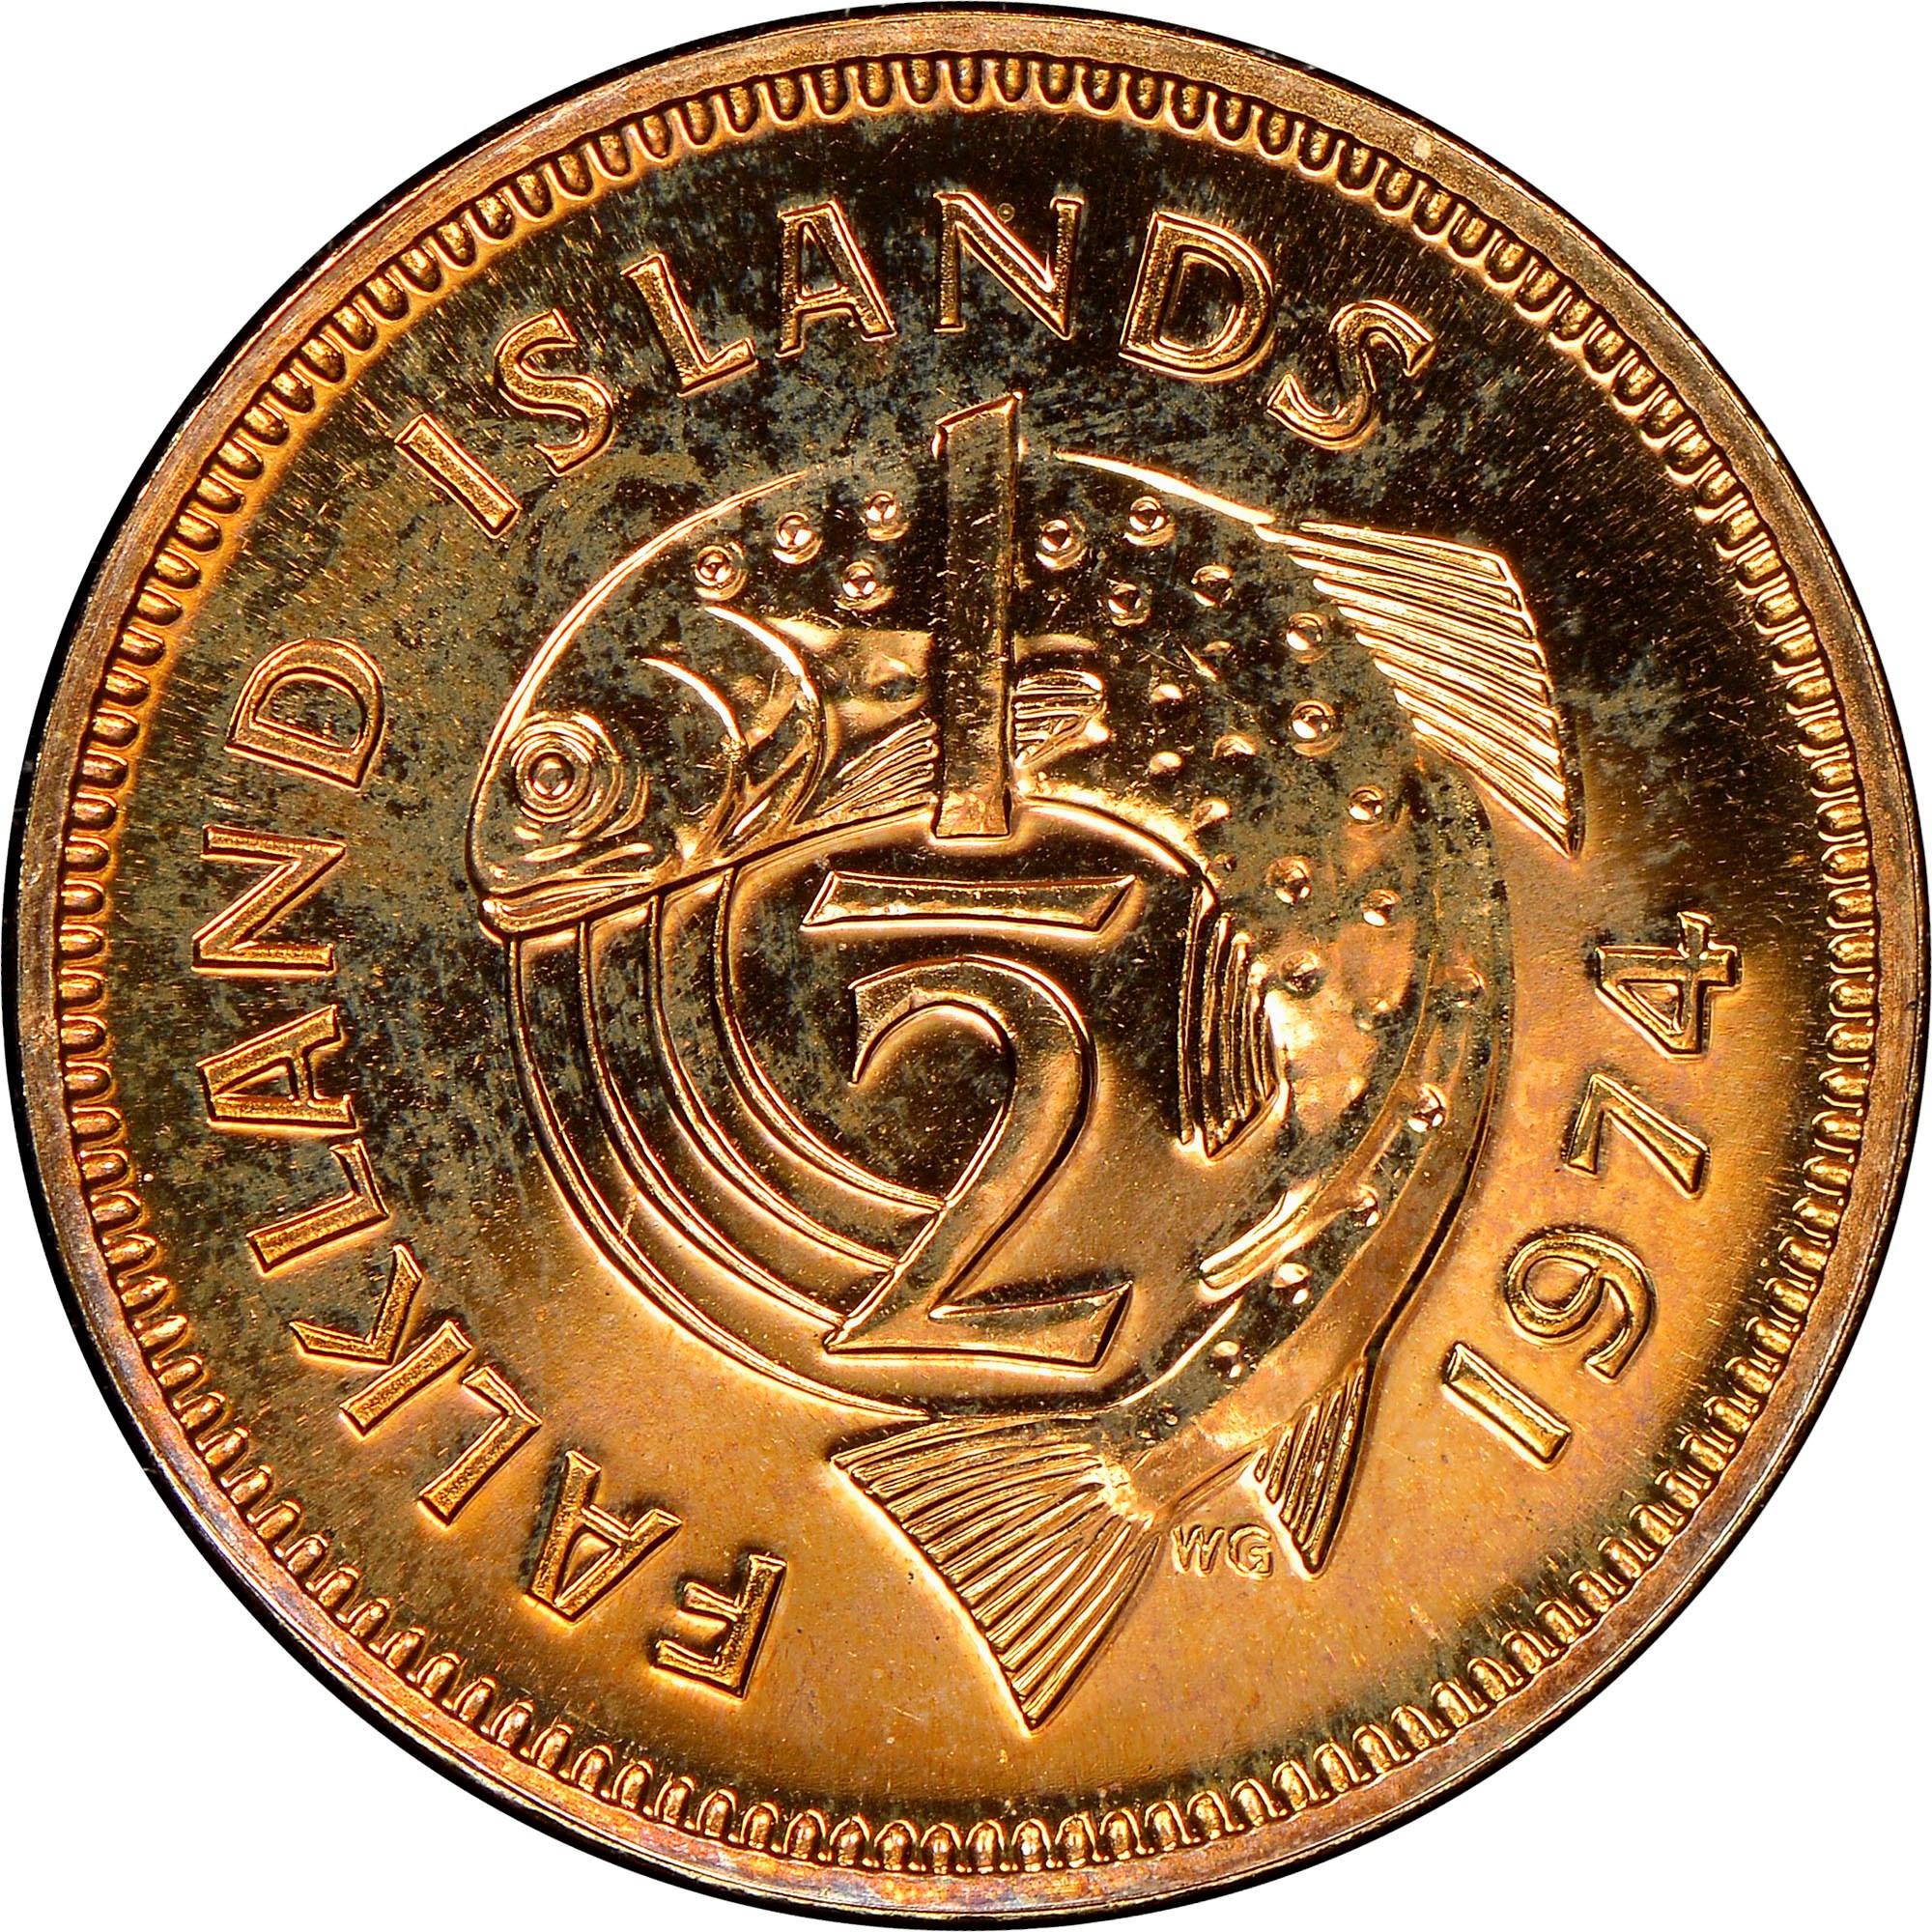 Falkland Islands 1/2 Penny reverse